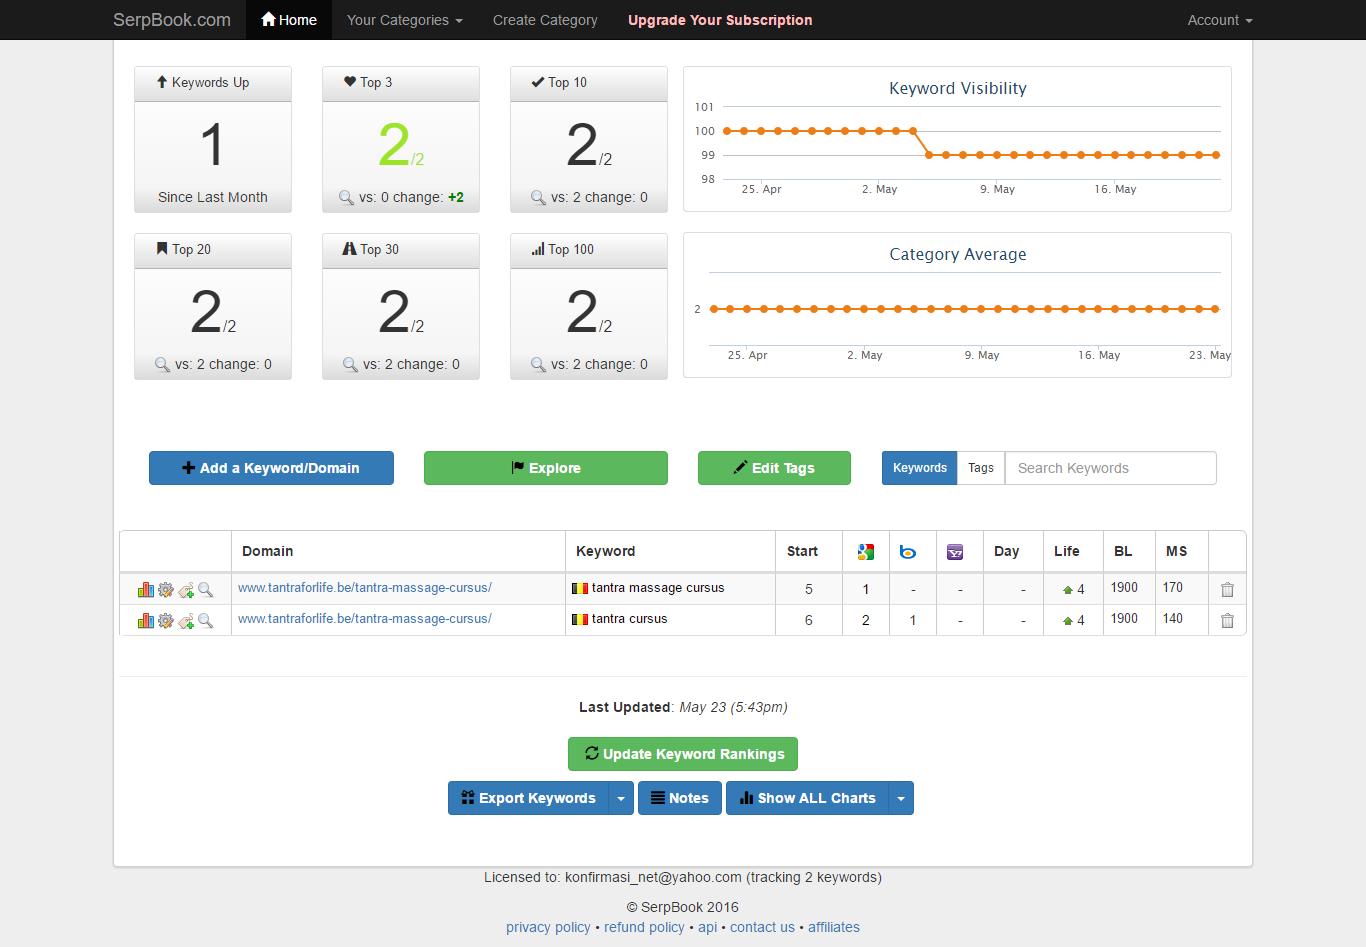 Skyrocket Your 2 Keywords With 100 DA/PA 10+ PBN Sites